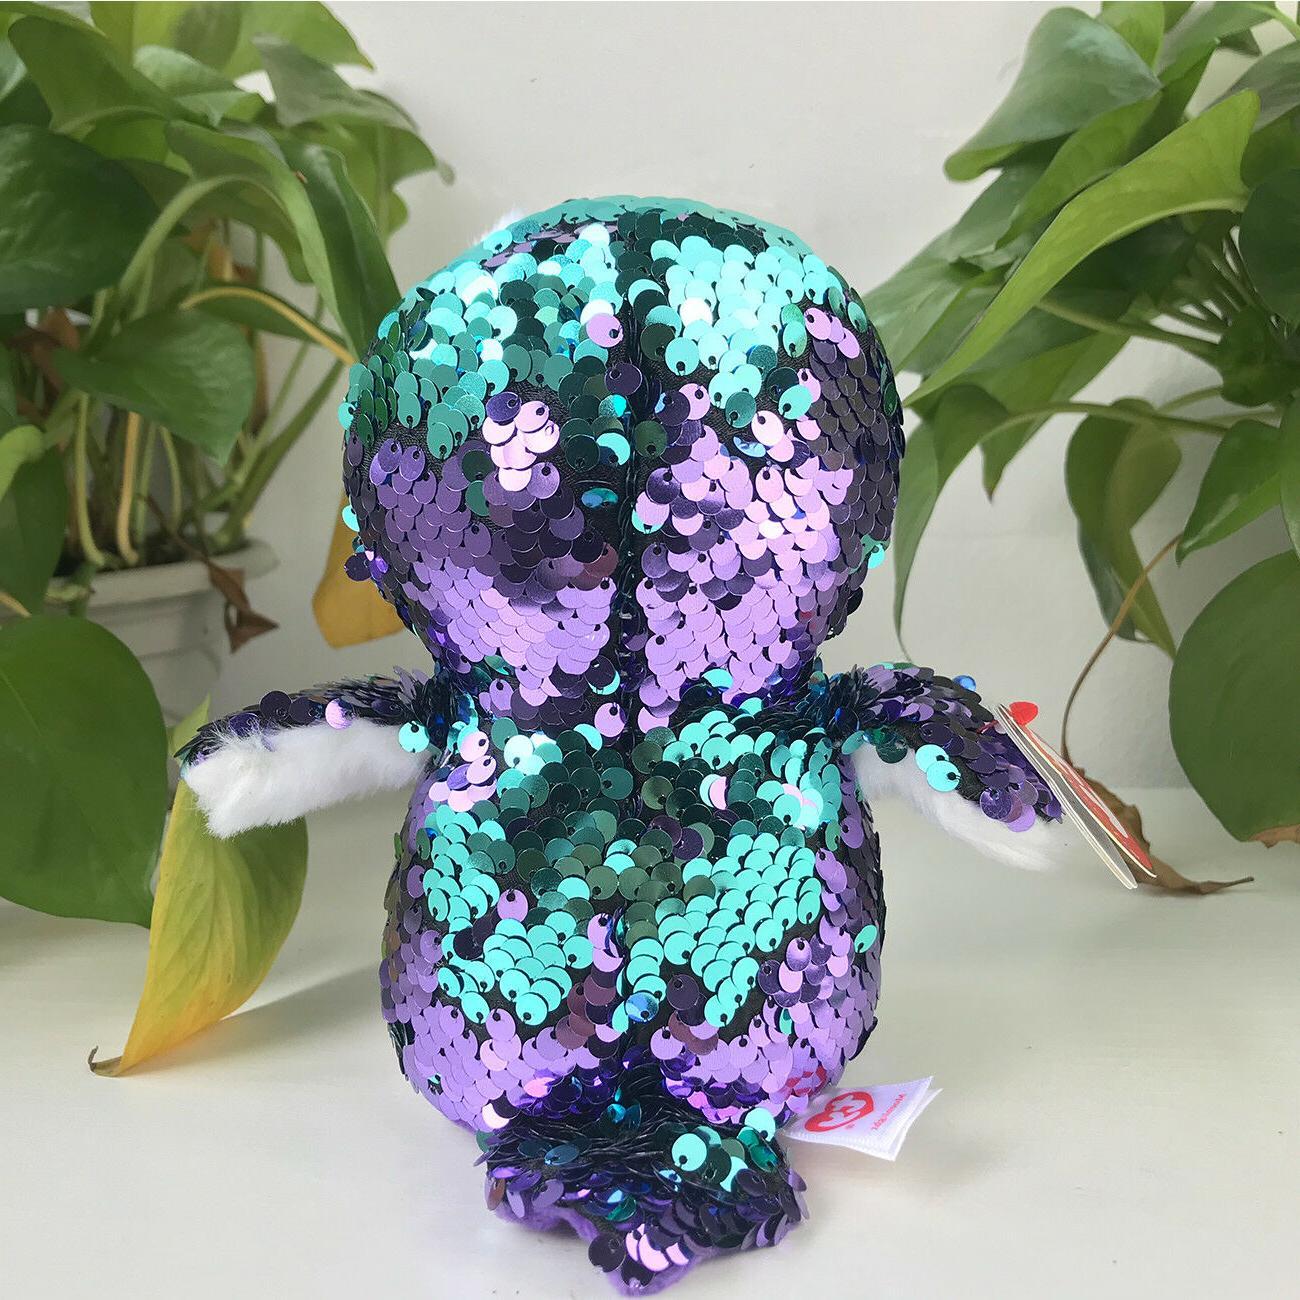 "New 6""ty Beanie Glitter Stuffed Animals Toys Kids Gift Sequin"